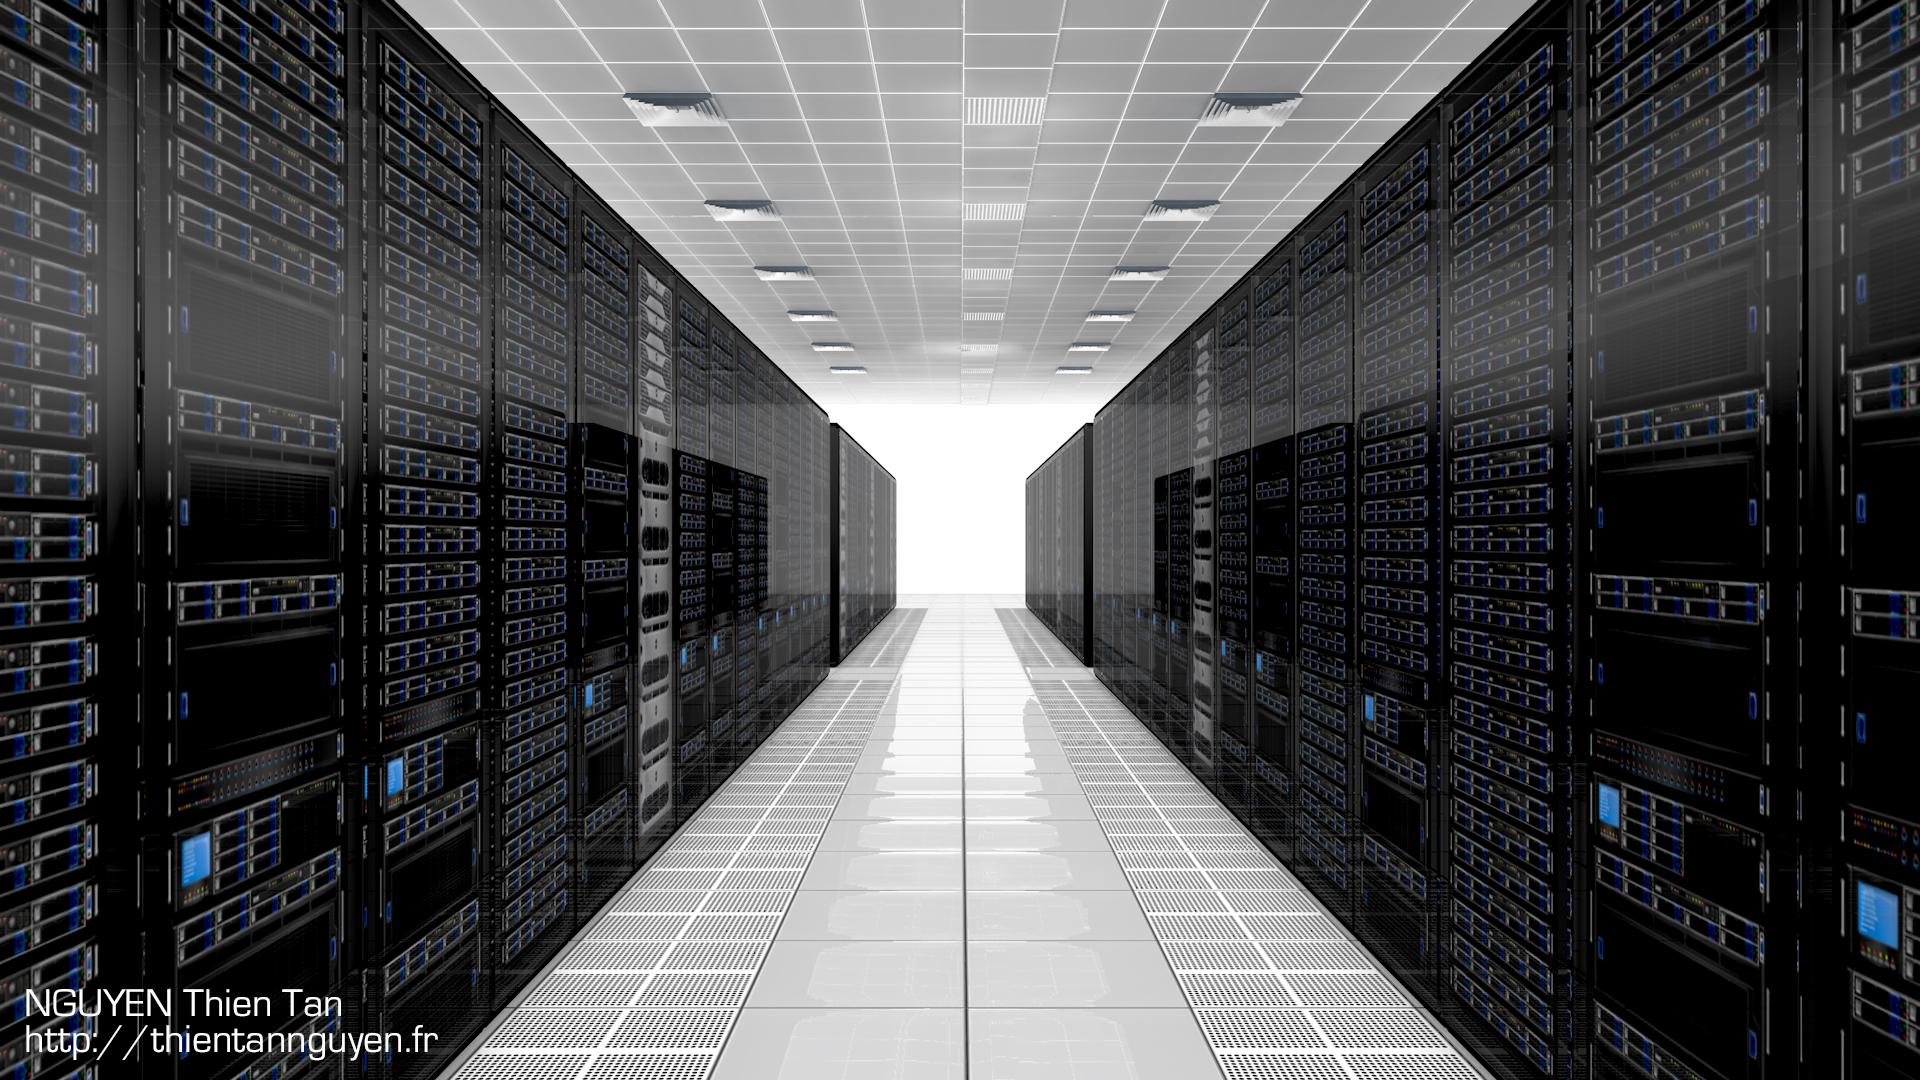 Data center wallpaper wallpapersafari - Cisco wallpaper 4k ...